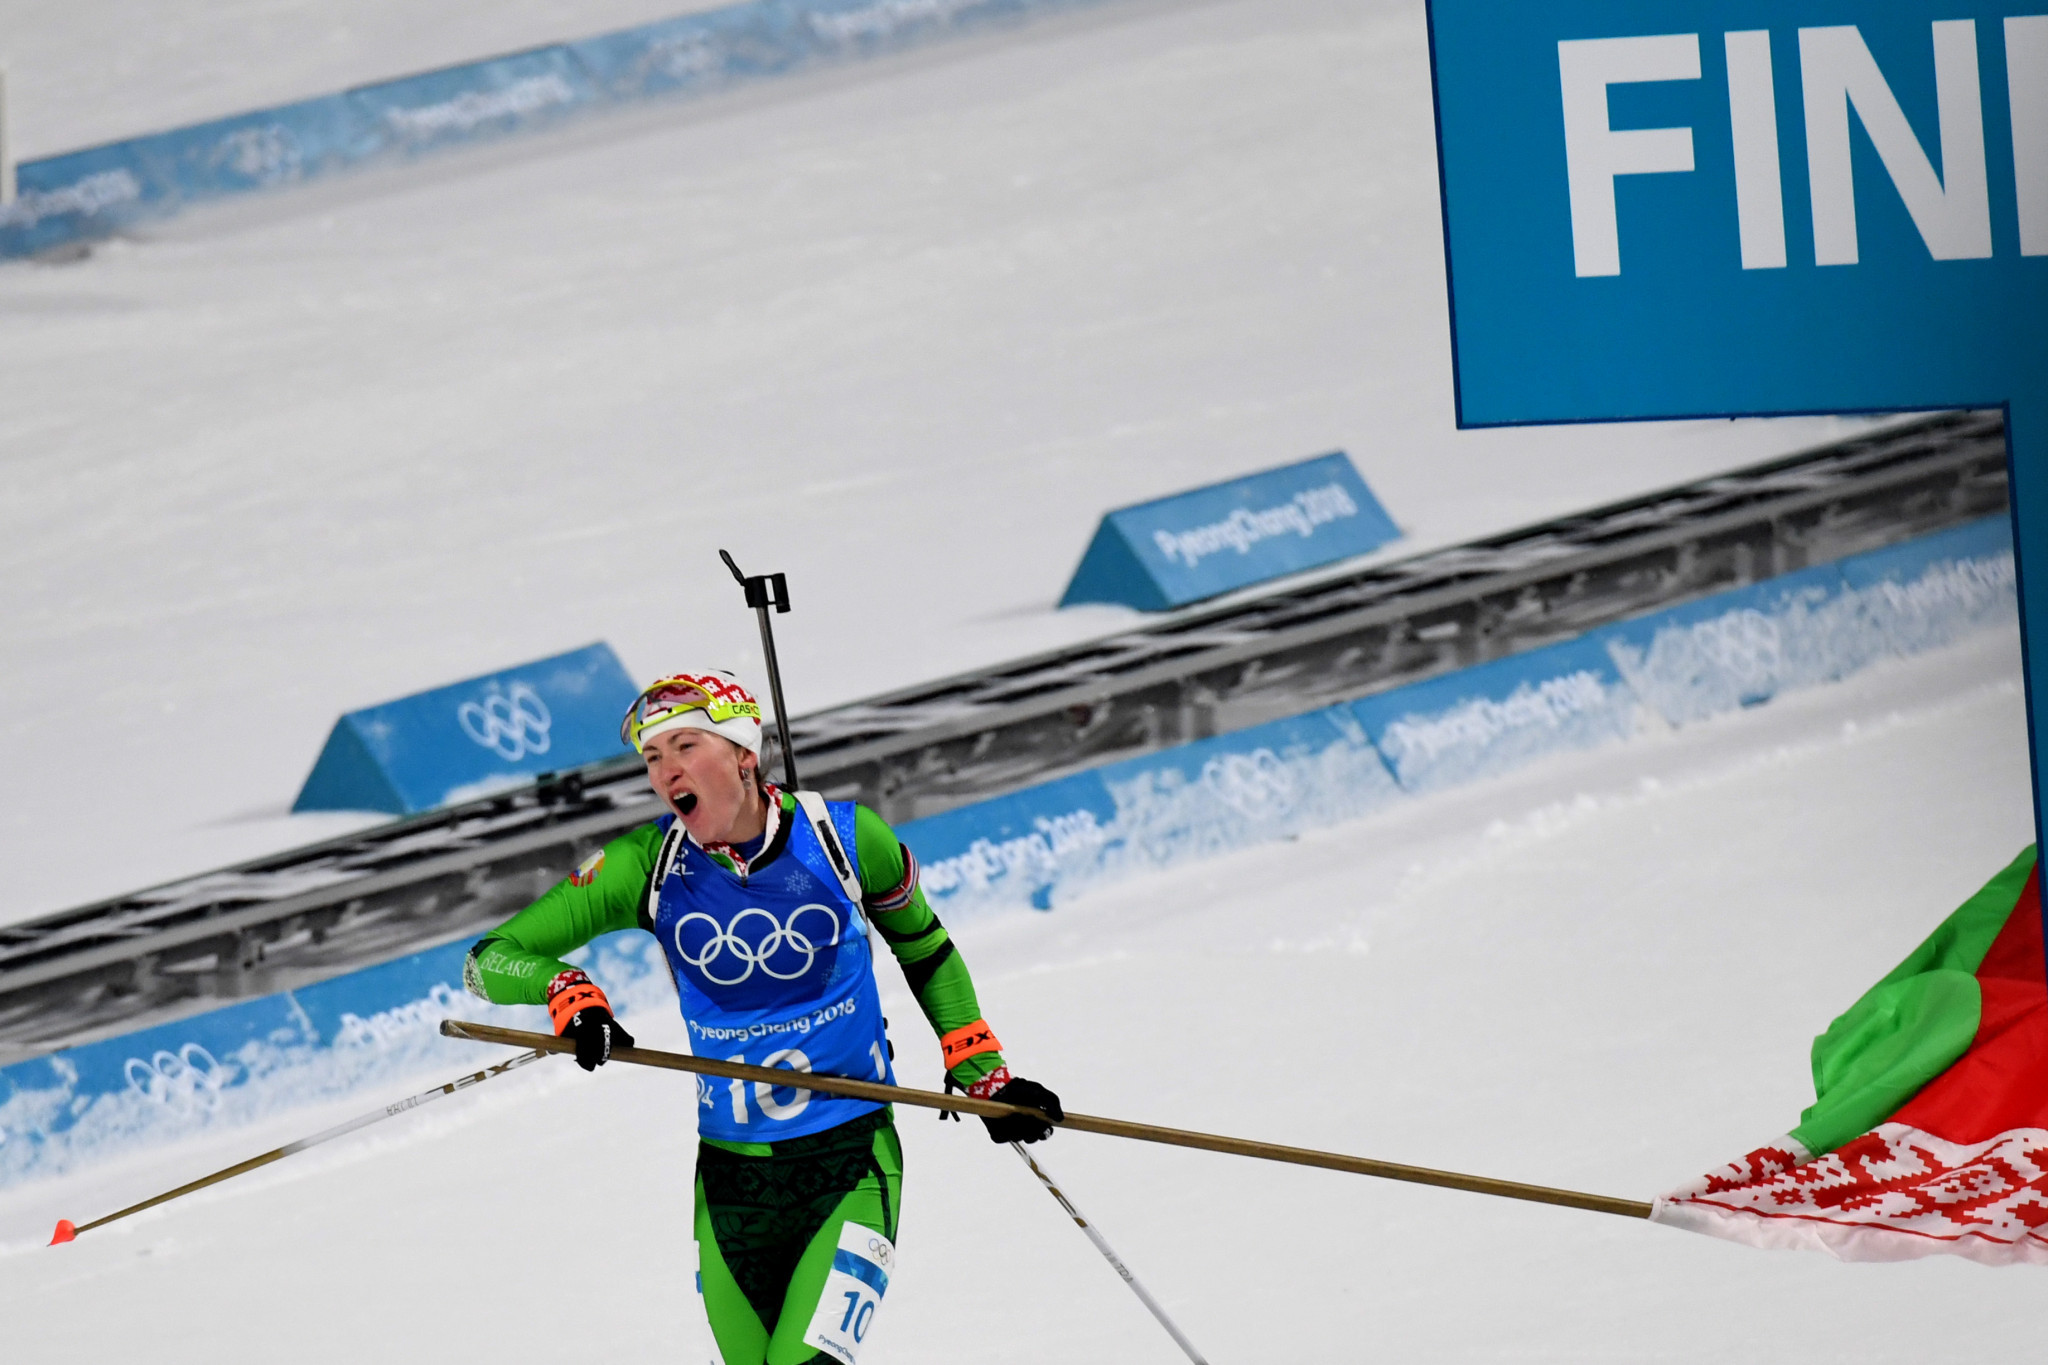 Domracheva secures women's biathlon relay gold for Belarus at Pyeongchang 2018